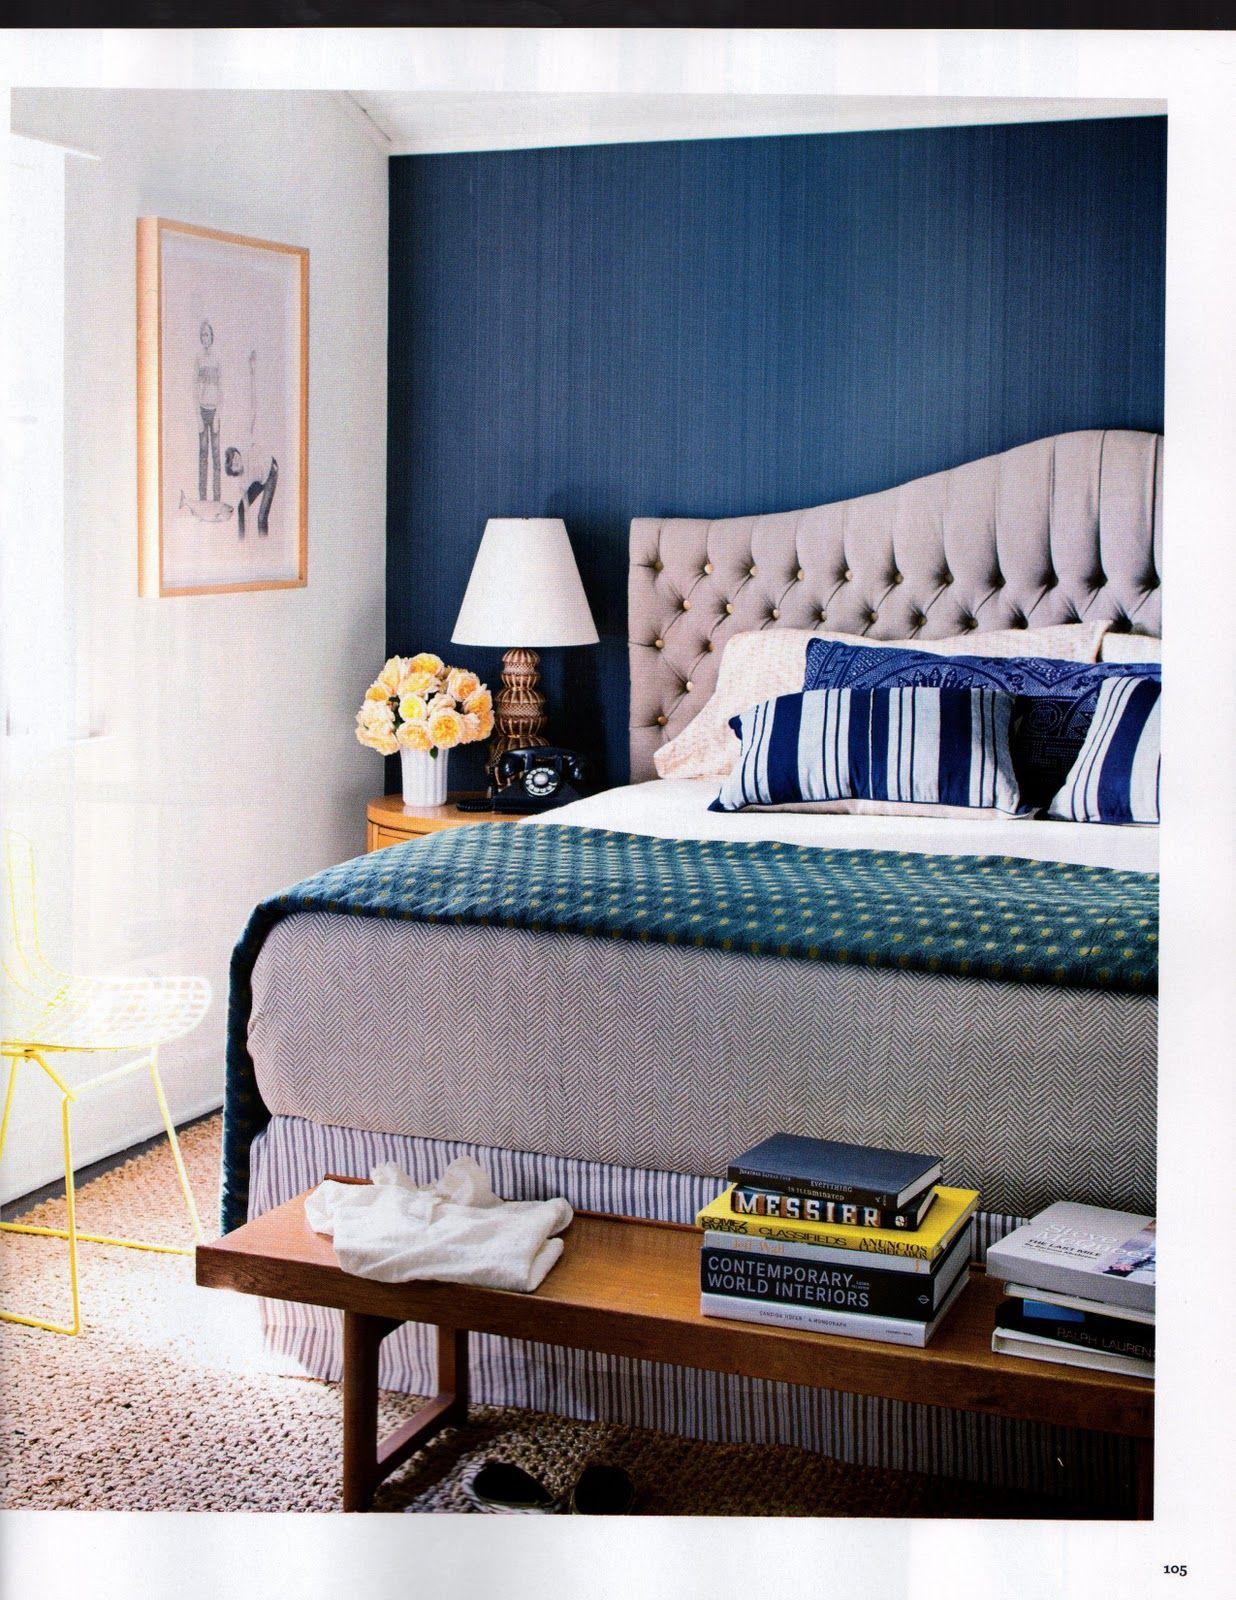 Dunkel Blaue Wandfarbe Hellblau Farbe Fur Schlafzimmer Marine Blau